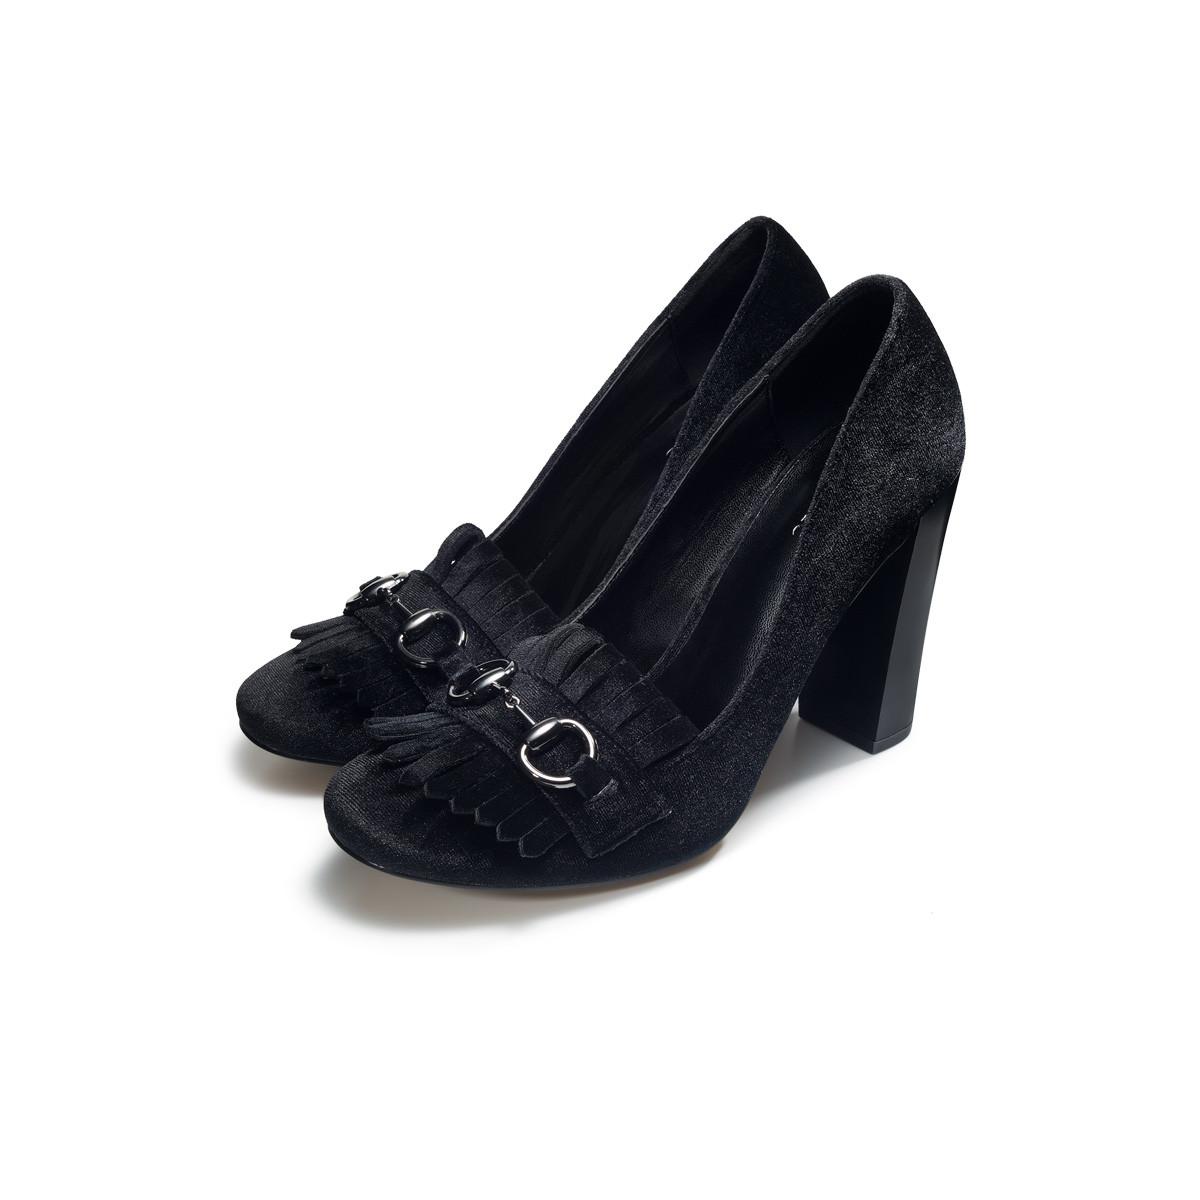 63d6eabe7 Faberlic Туфли женские Violet черные размер 35 36 37 38 39 40 Осенняя  сказка PMW018 арт